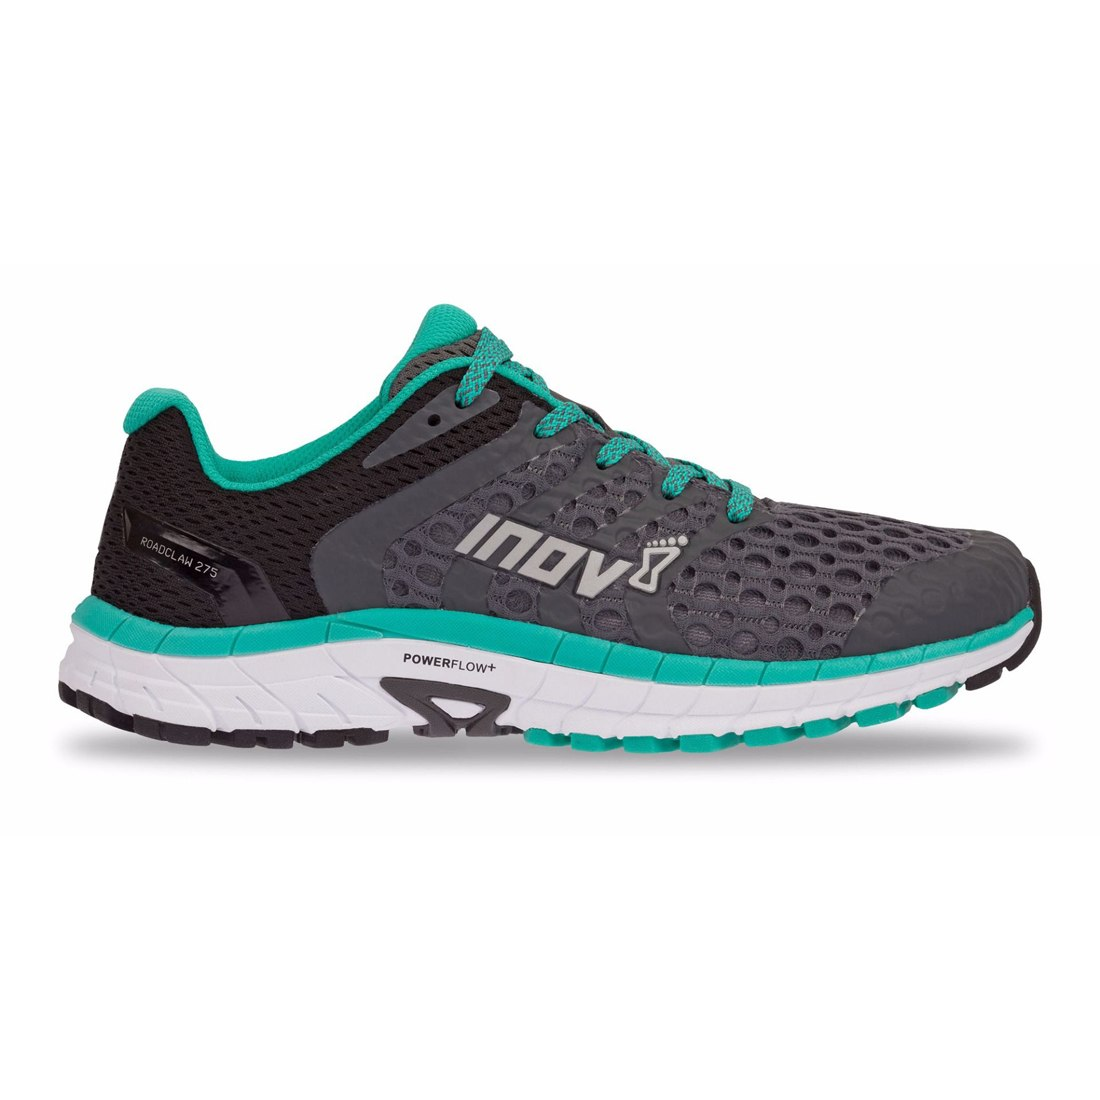 Inov-8 Roadclaw 275 V2 Womens Running Shoe - grey/teal